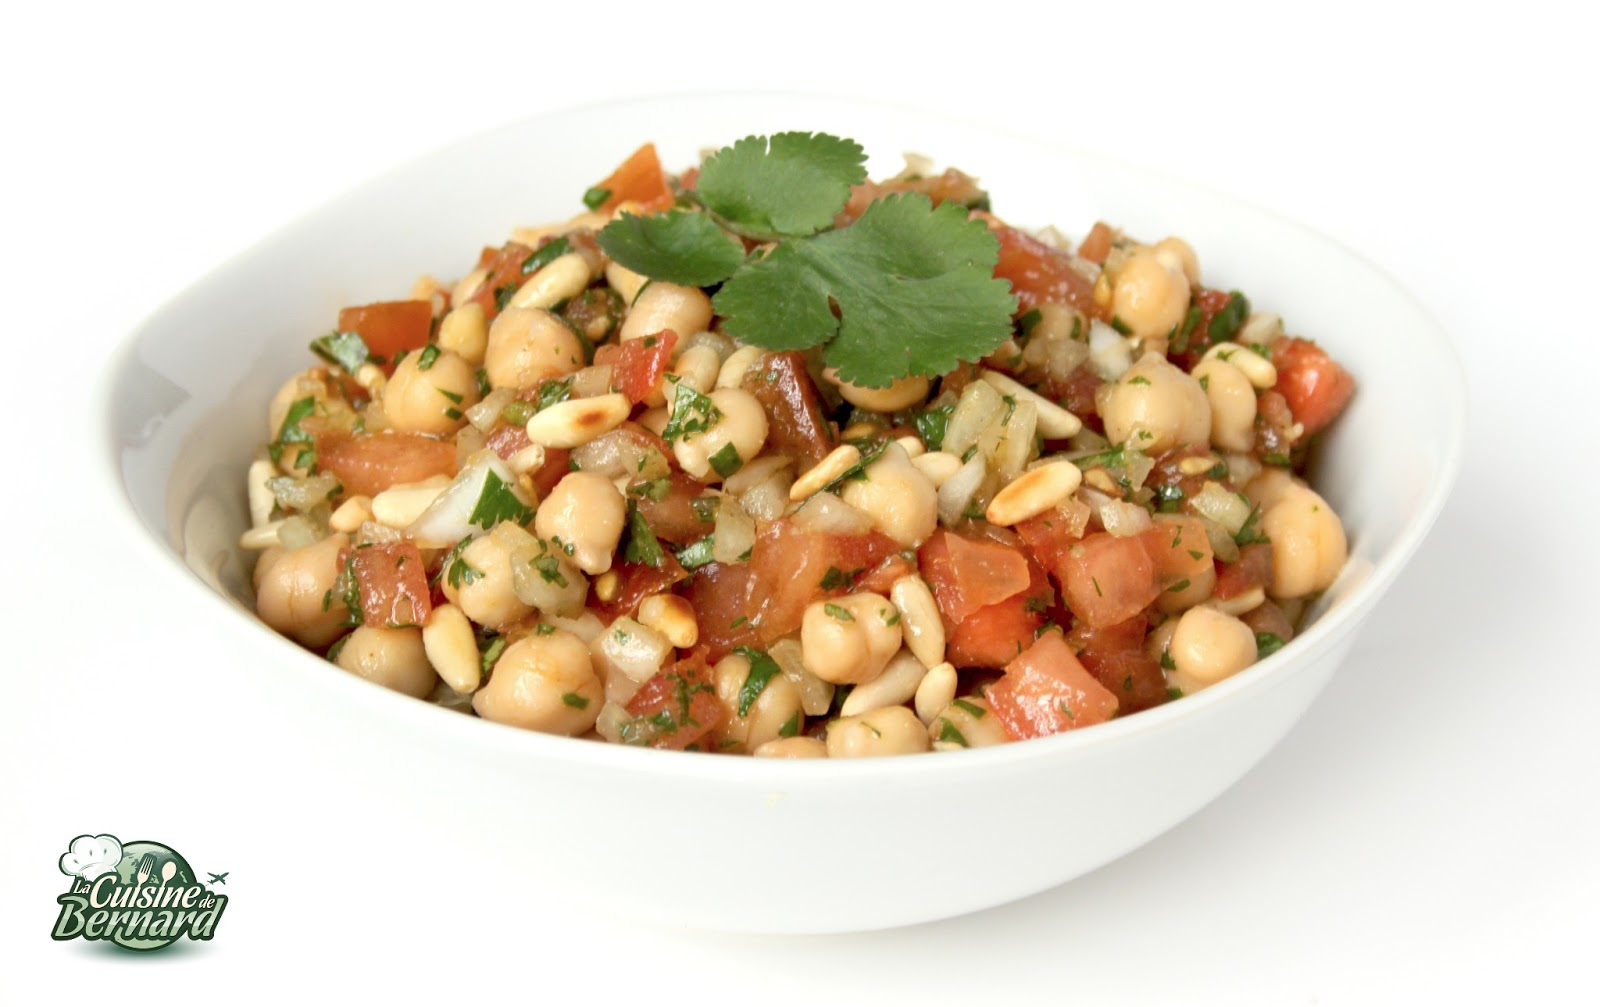 La cuisine de bernard salade de pois chiches for A cuisine de bernard